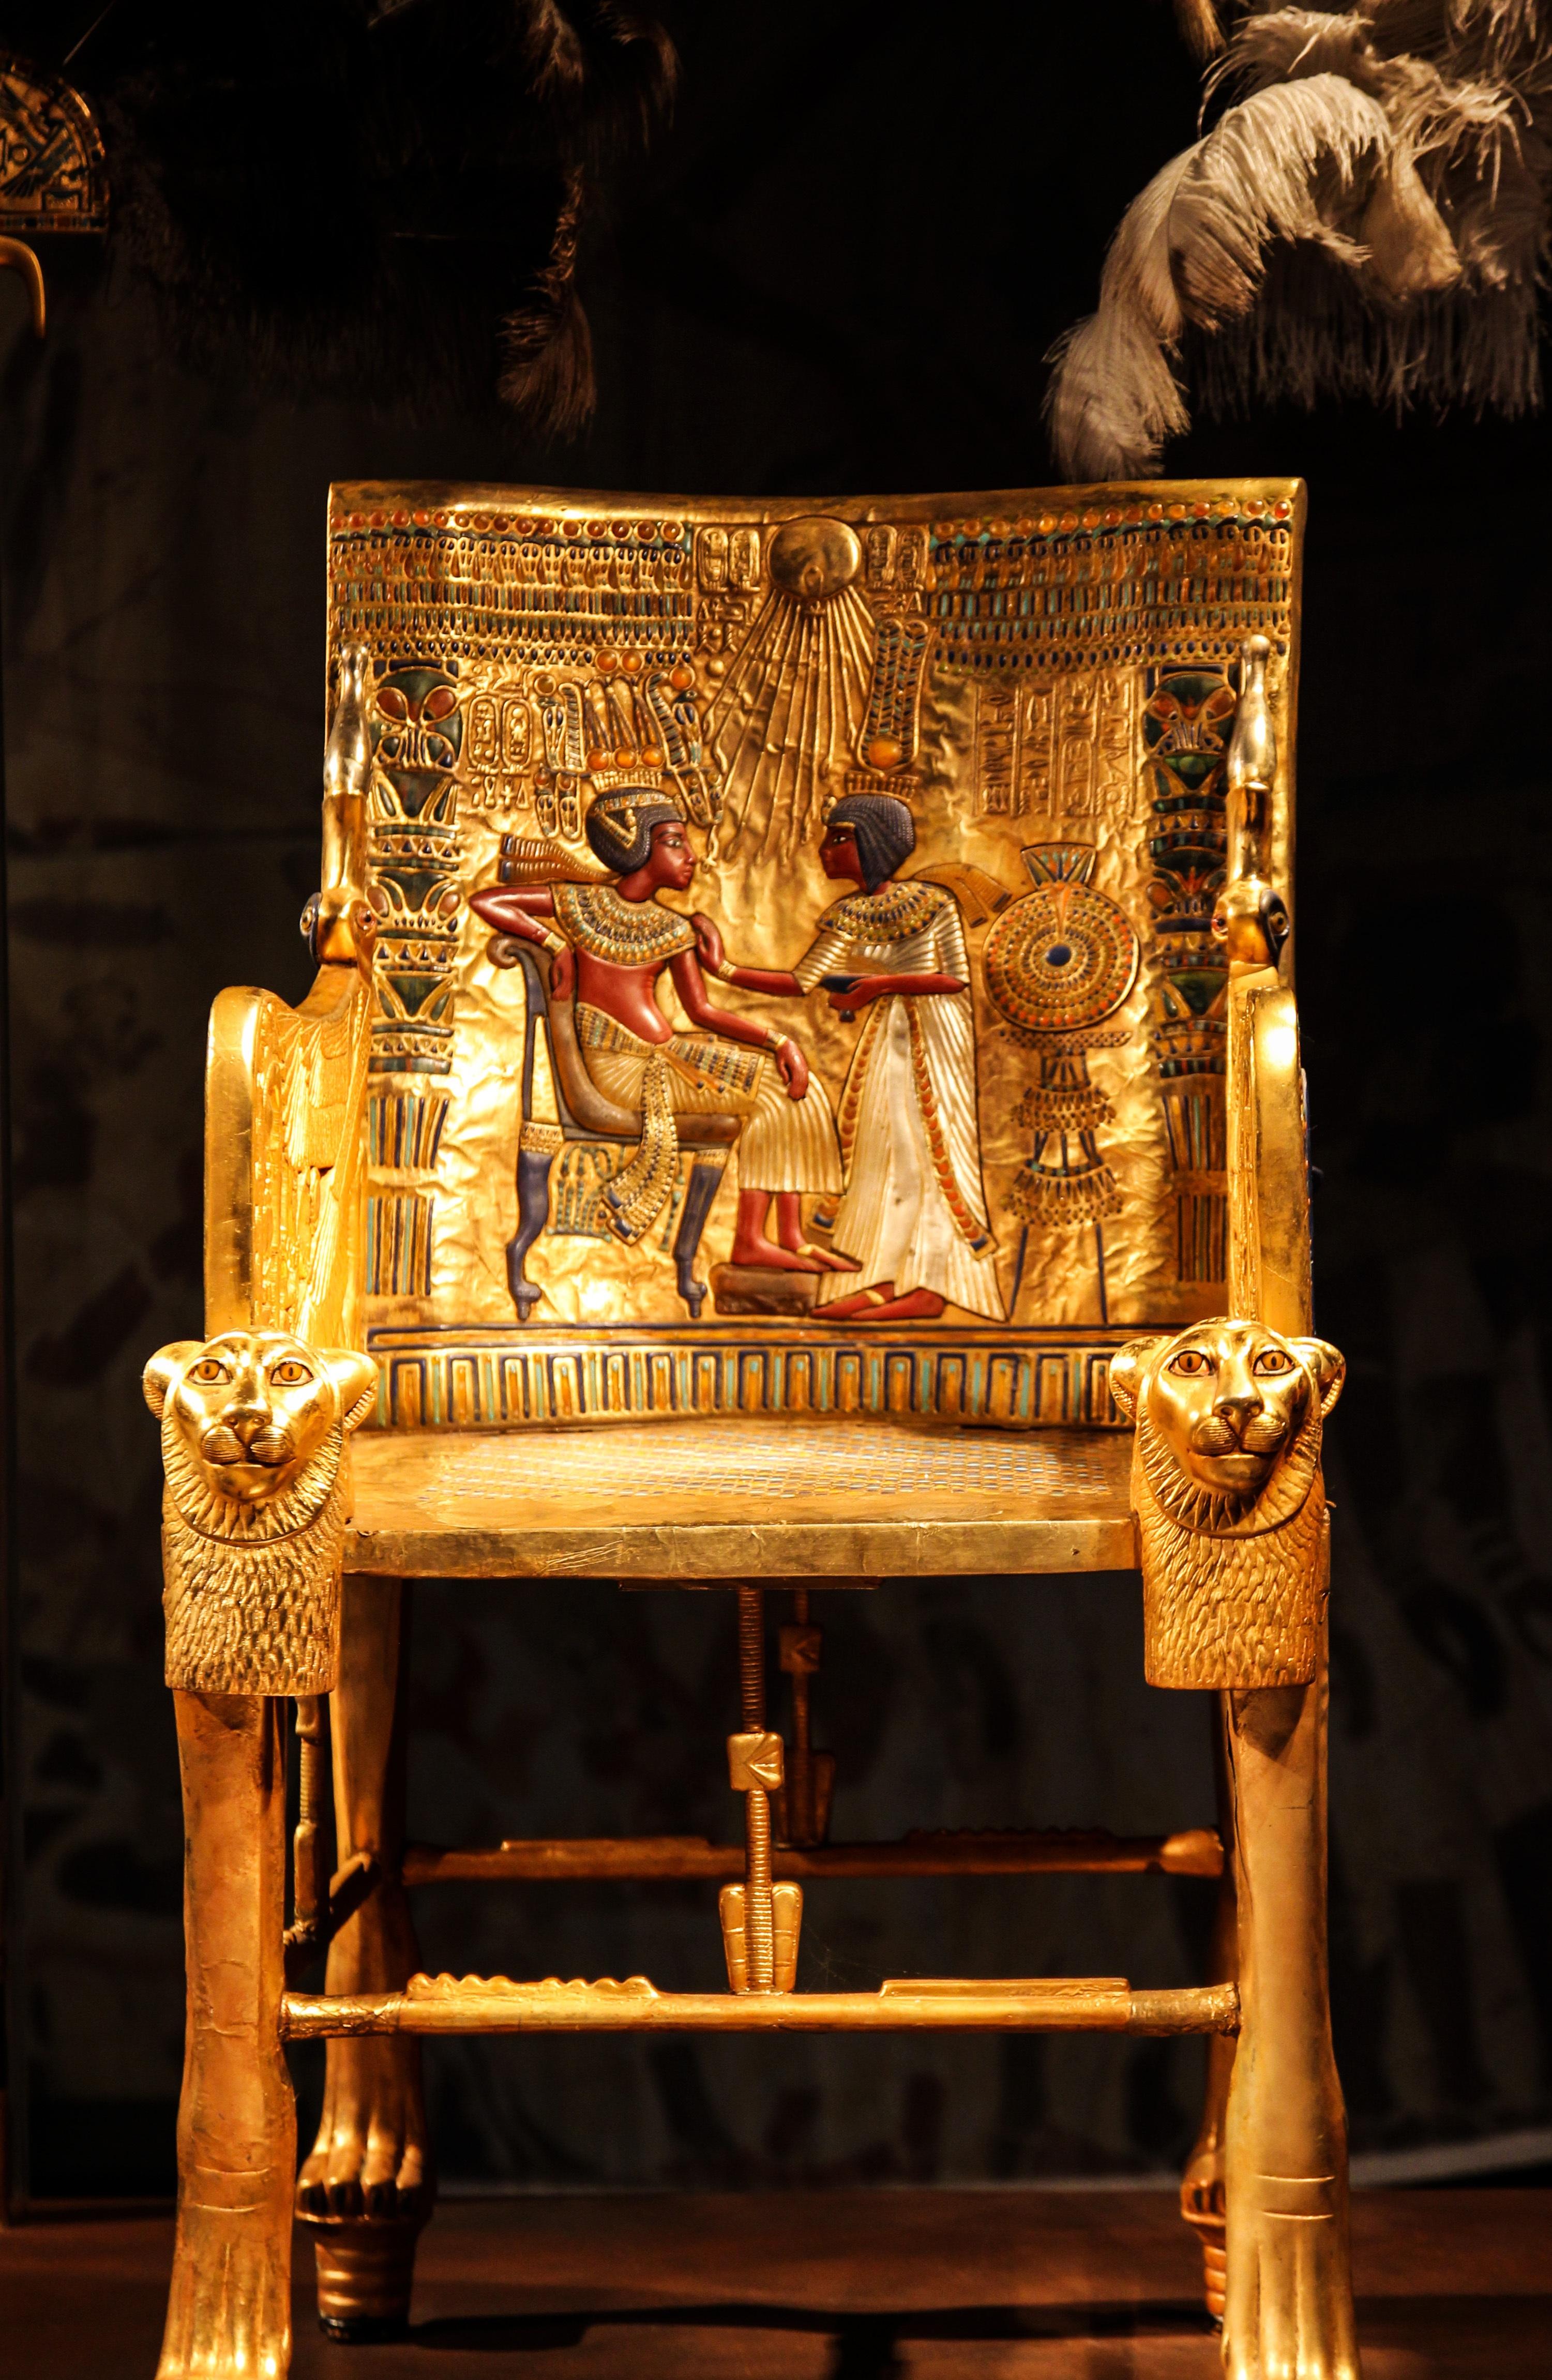 Ancient Chair, Ancient, Chair, Civilization, Dynasty, HQ Photo